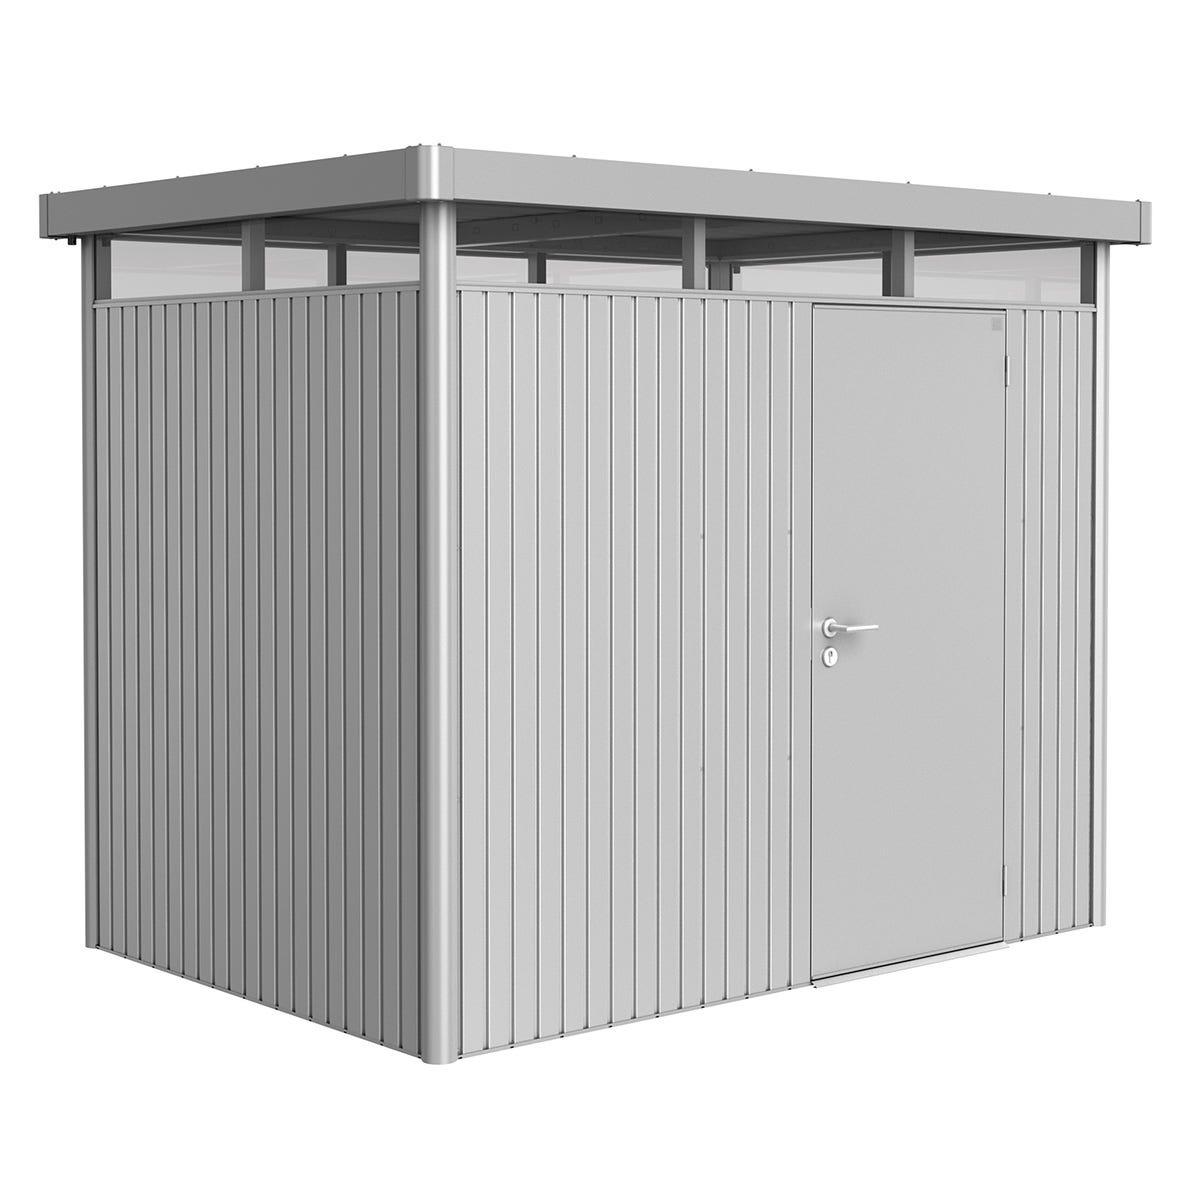 Biohort Highline Metal Shed H2 Standard door 9 x 6 - Metallic Silver